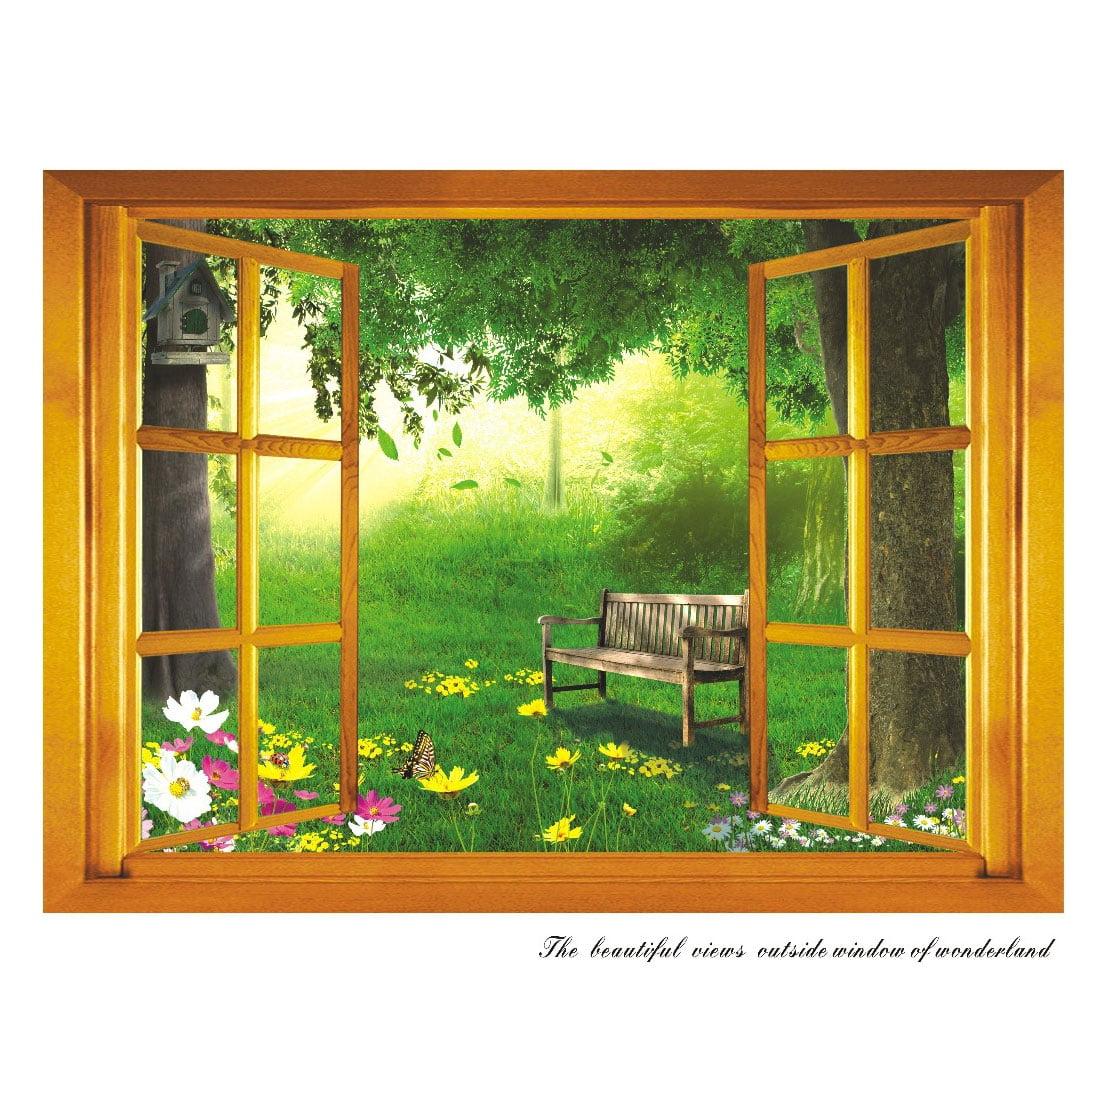 Home Decor Window Grassland Pattern Removable Wall Sticker Decal